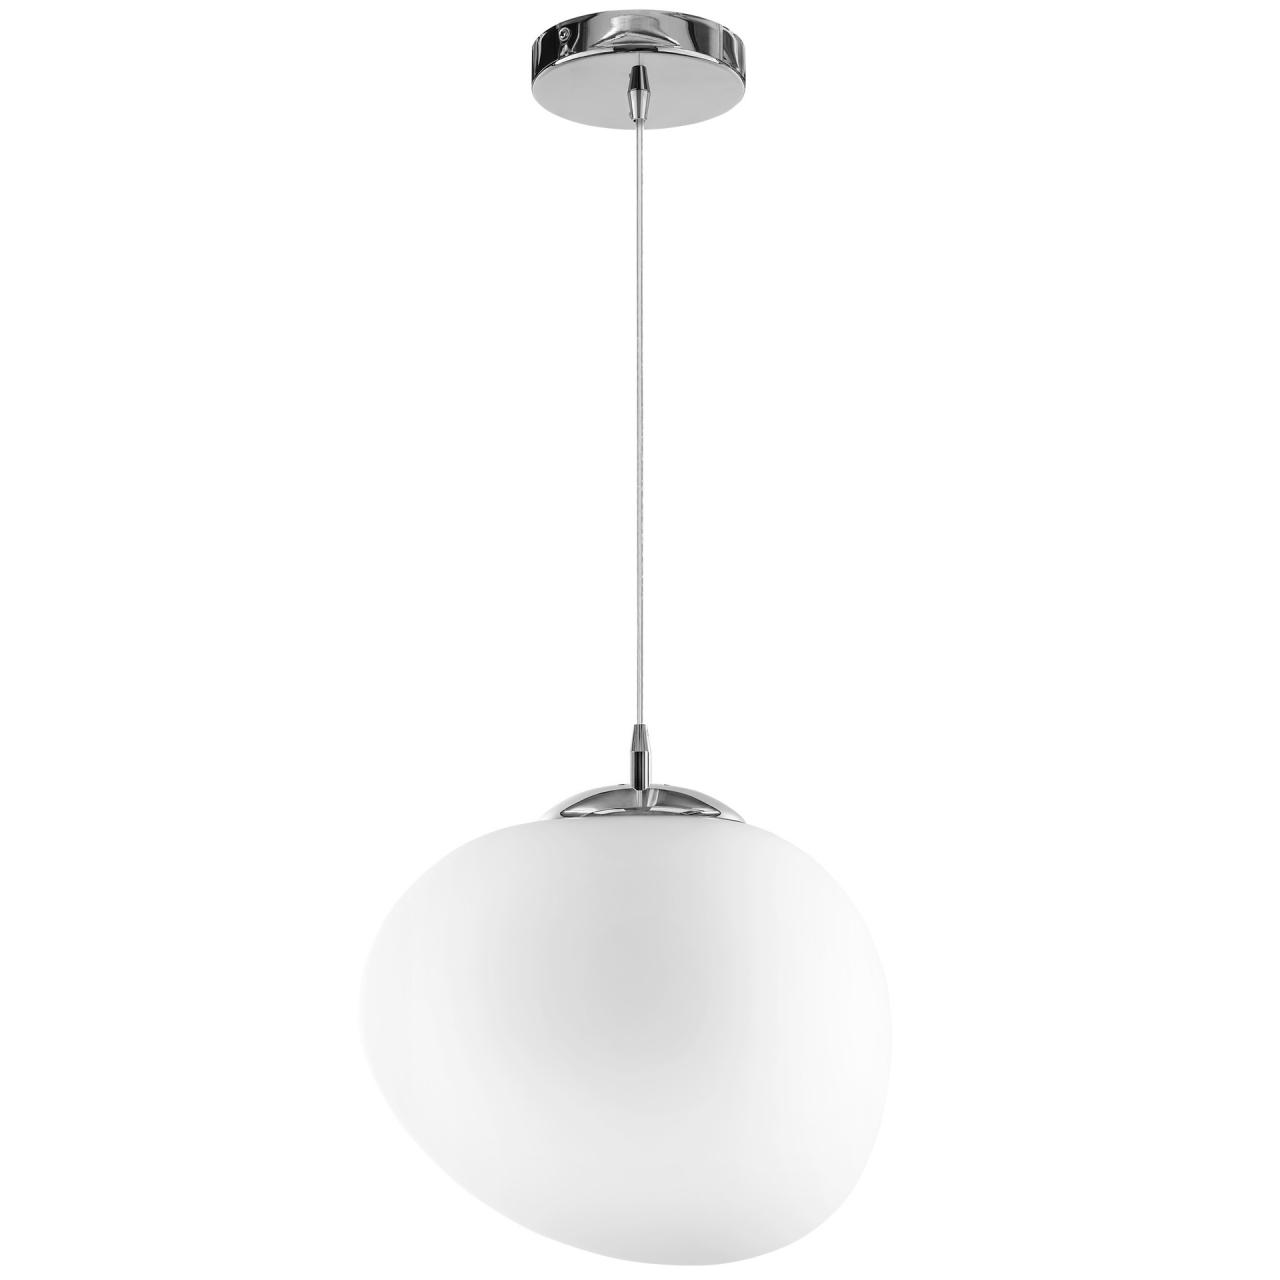 Люстра подвесная Arnia 1Х40W E27 Белый Lightstar 805016